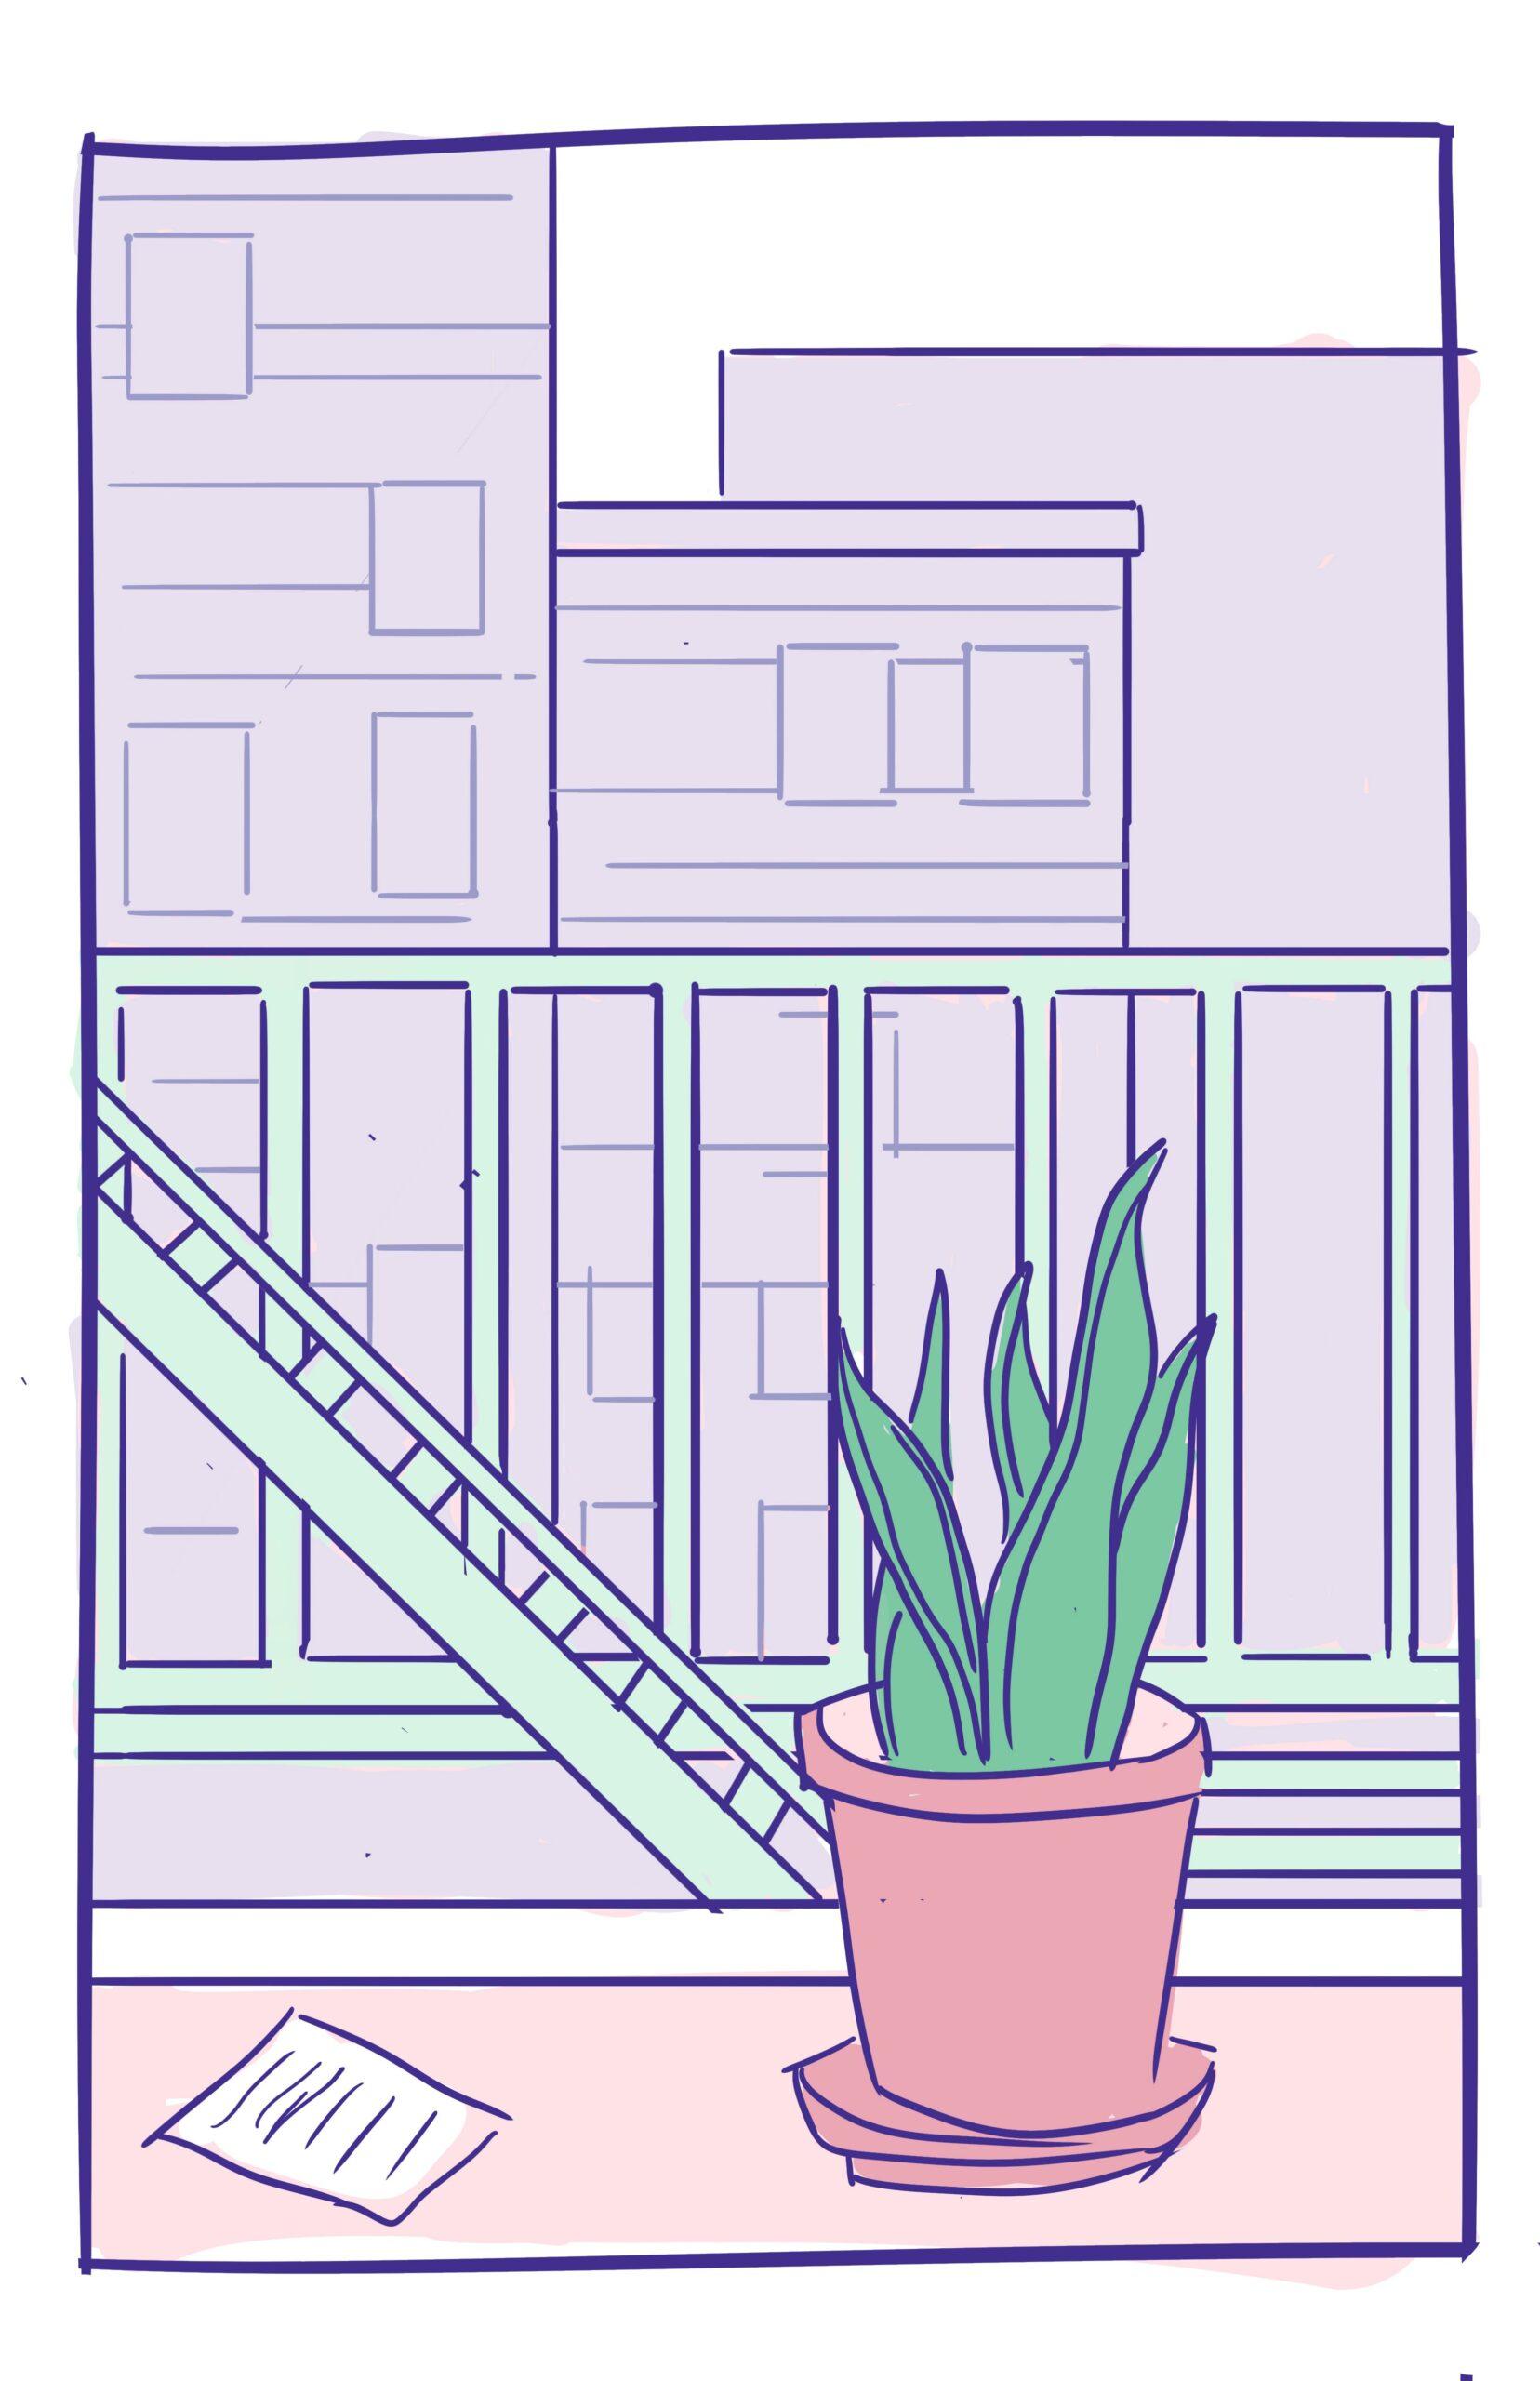 plant_semplice